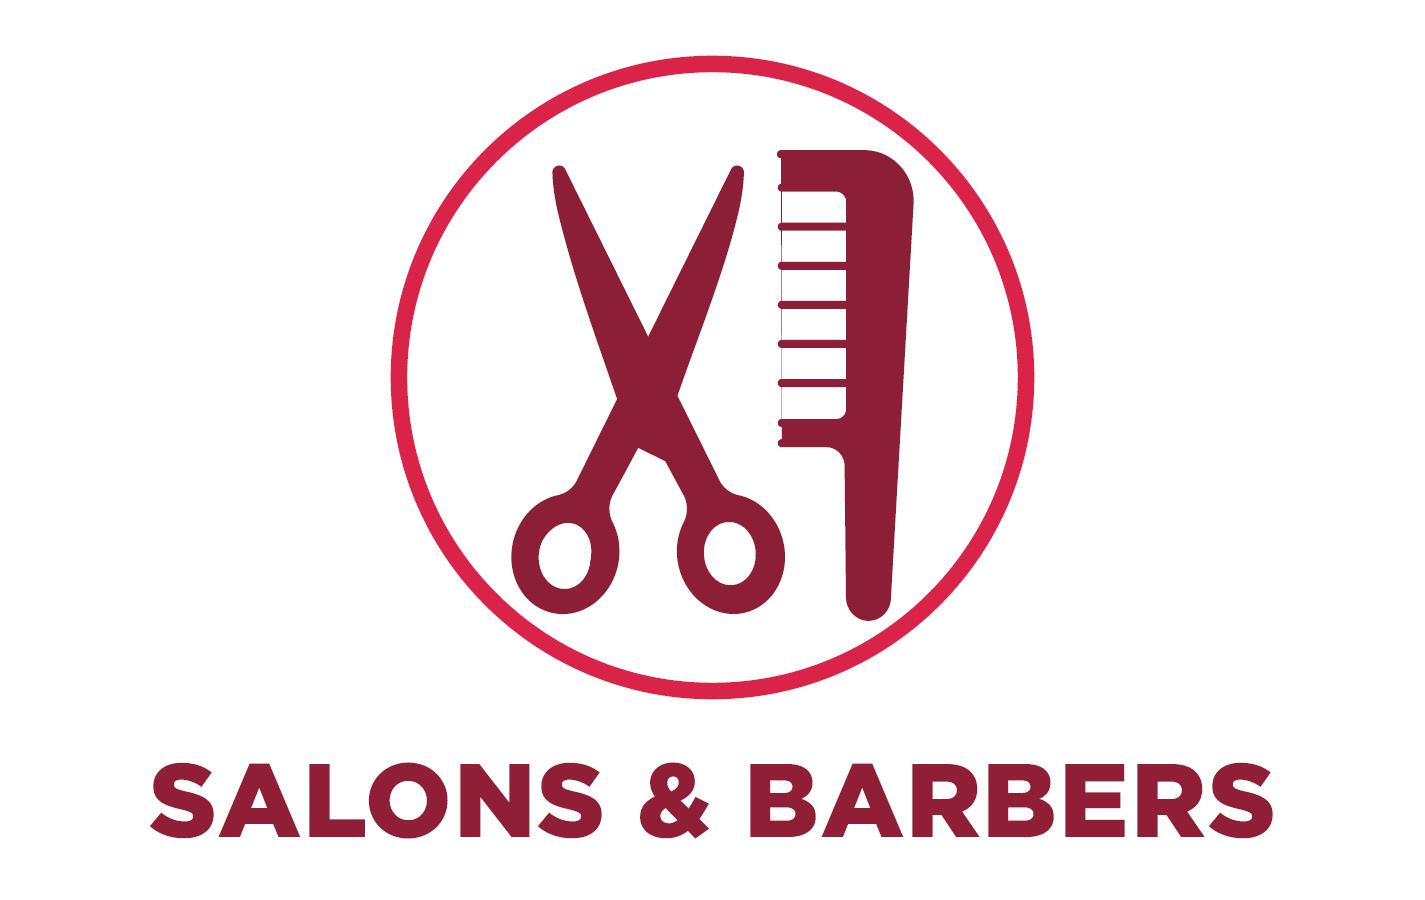 Salons & Barbers